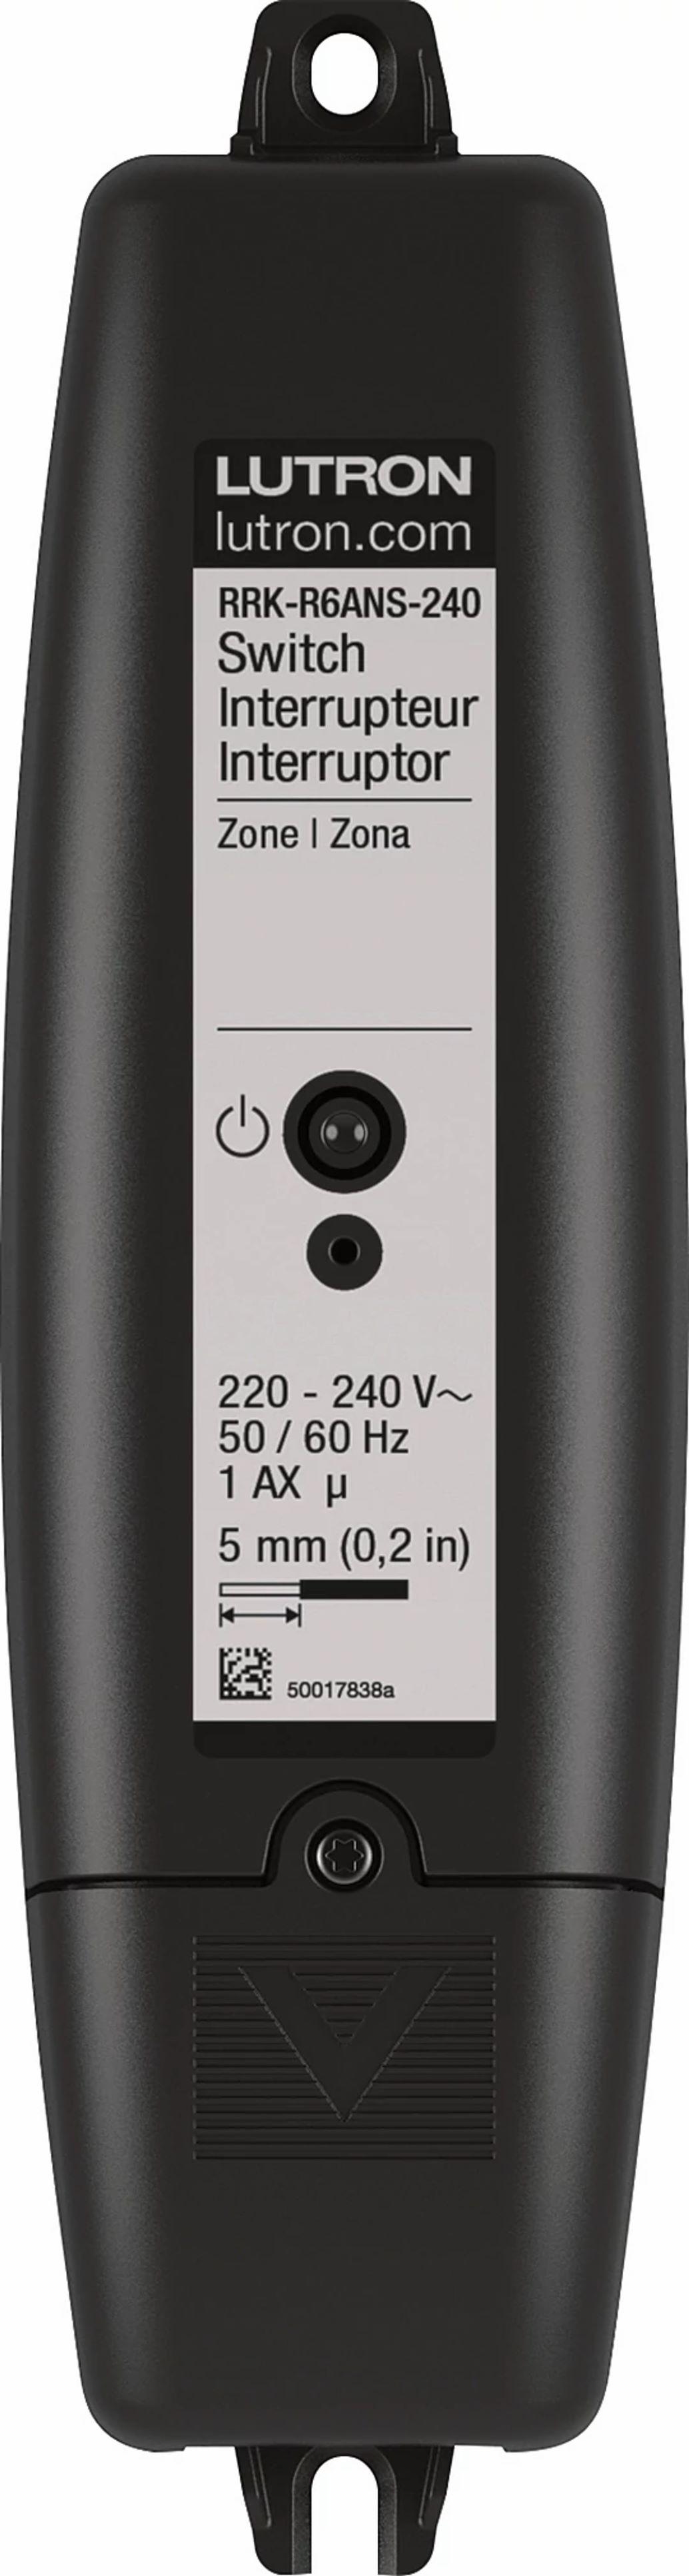 Lutron RRK-R6ANS-240 RA2 Switch 5A